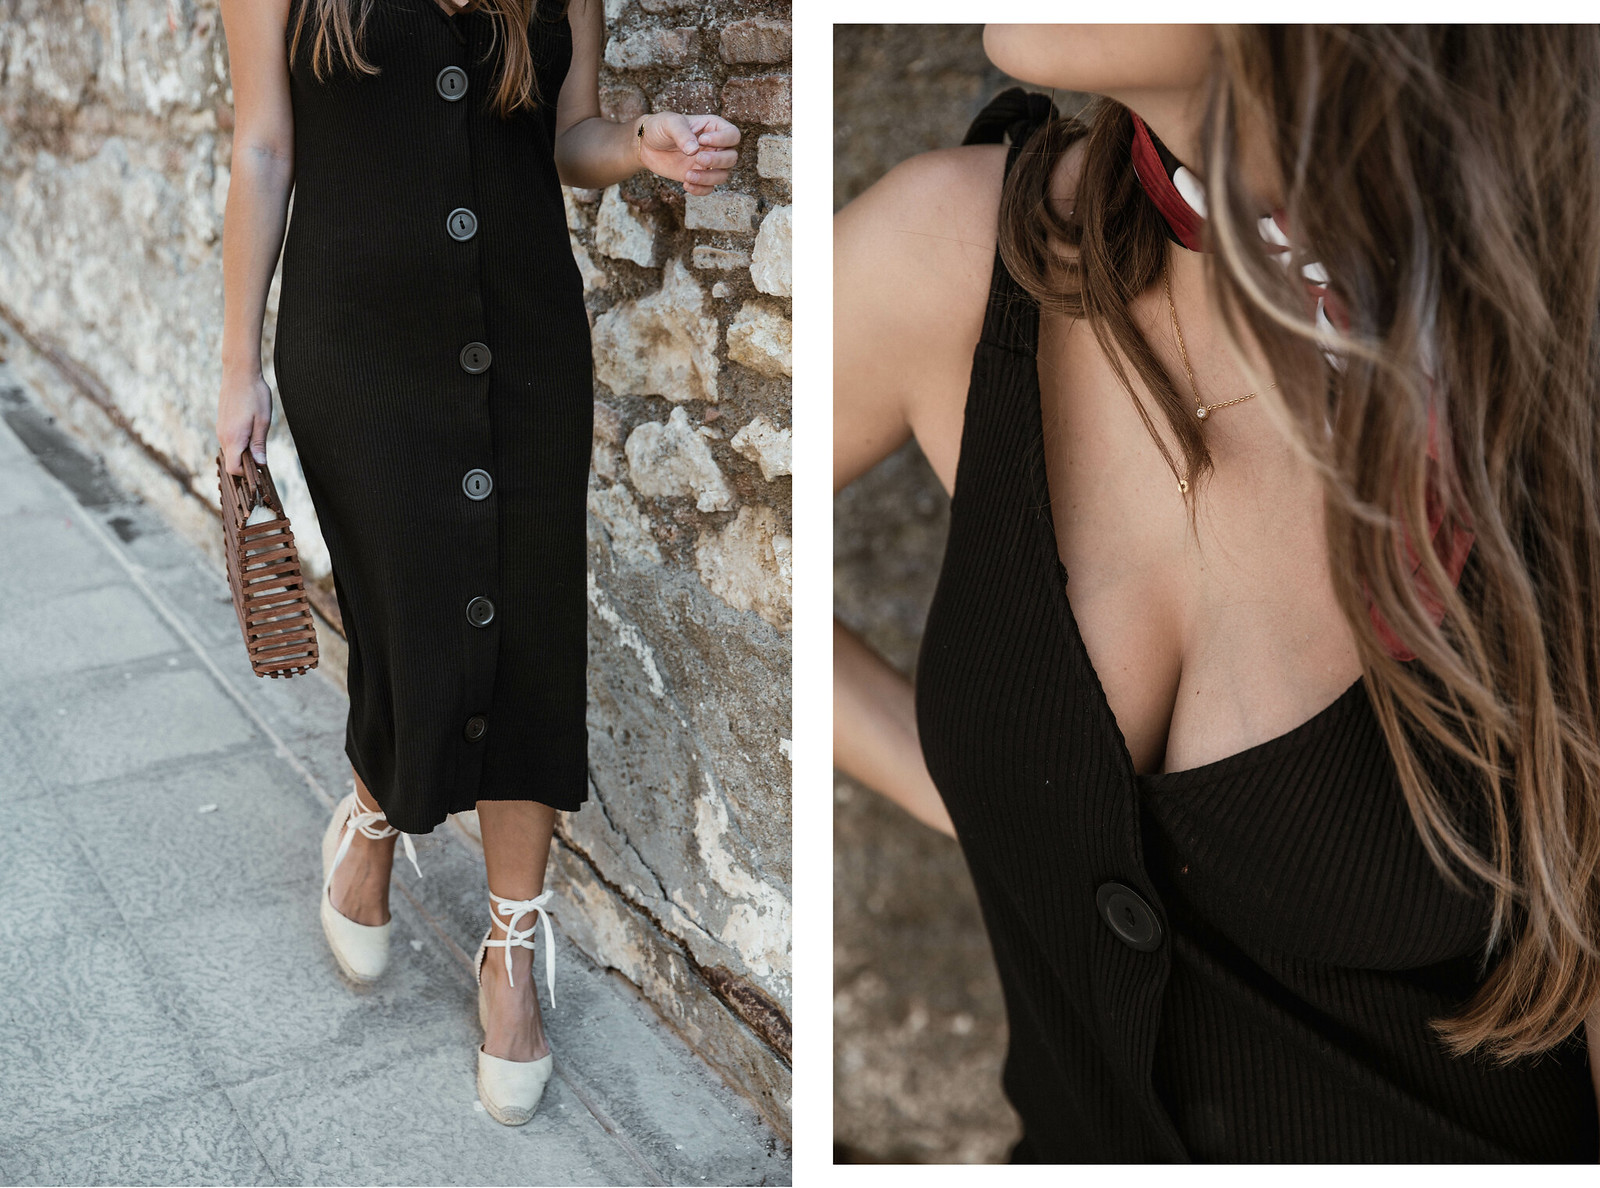 seams for a desire - jessie chanes - black tight dress - zara-1